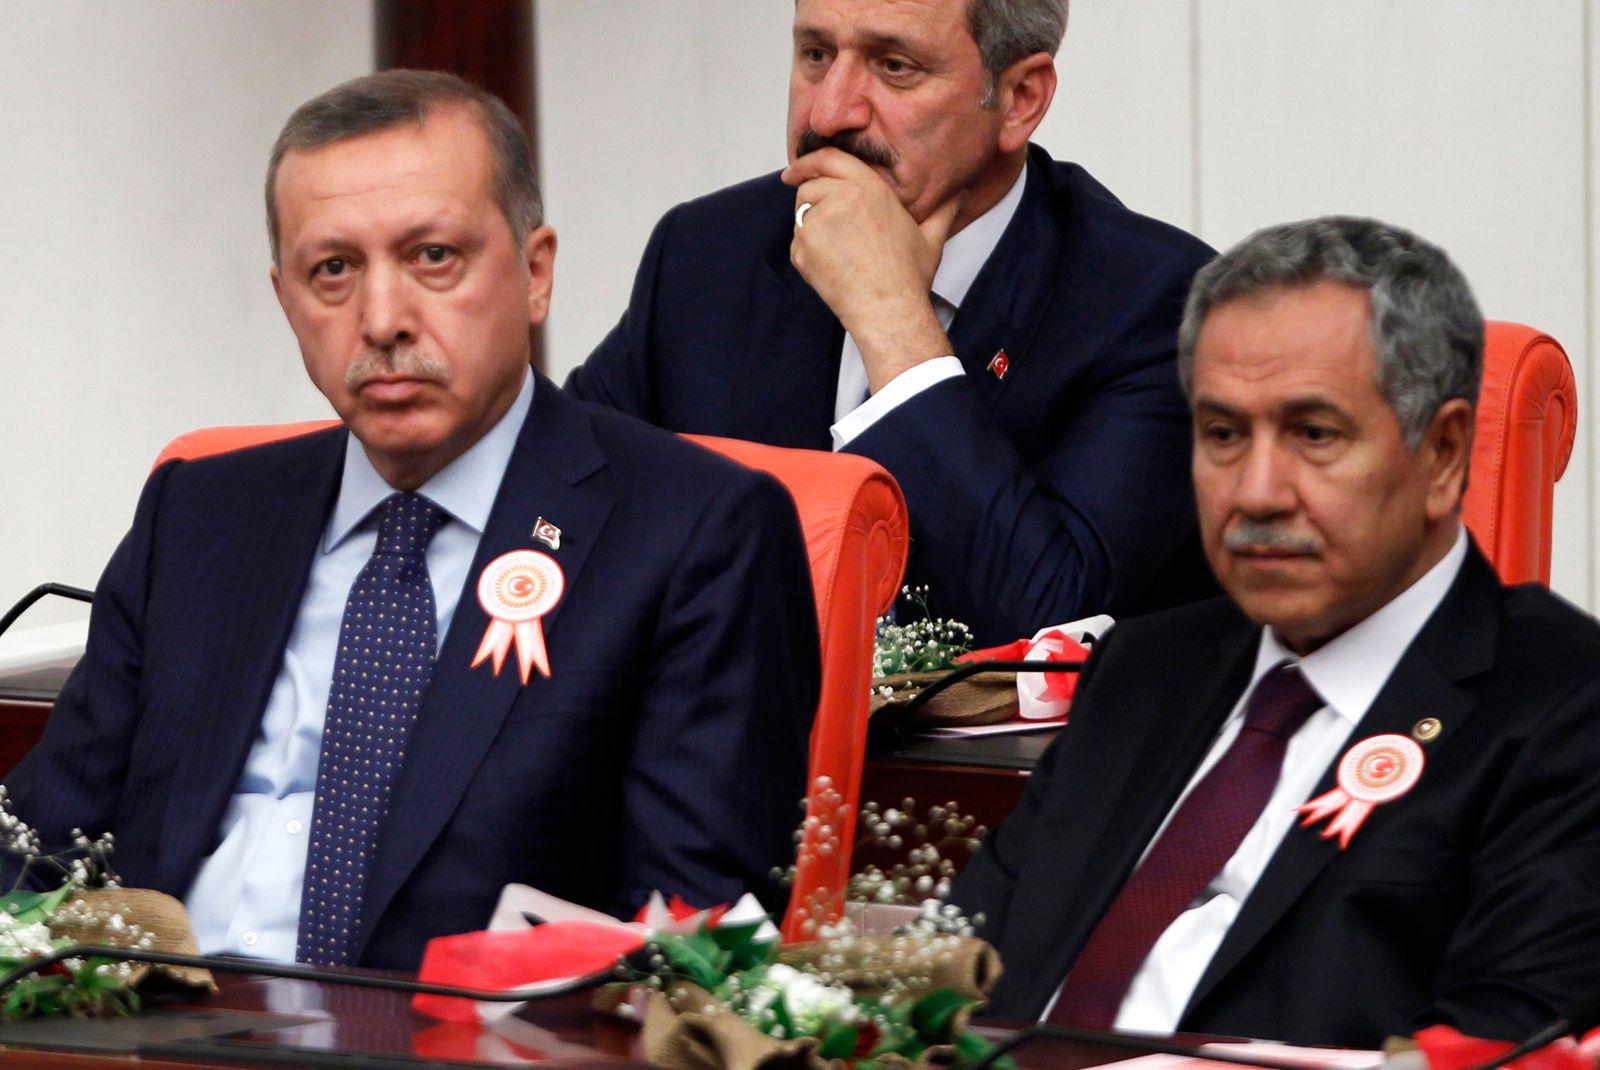 Turkey's Prime Minister Tayyip Erdogan attends swearing-in ceremony in Turkish Parliament in Ankara